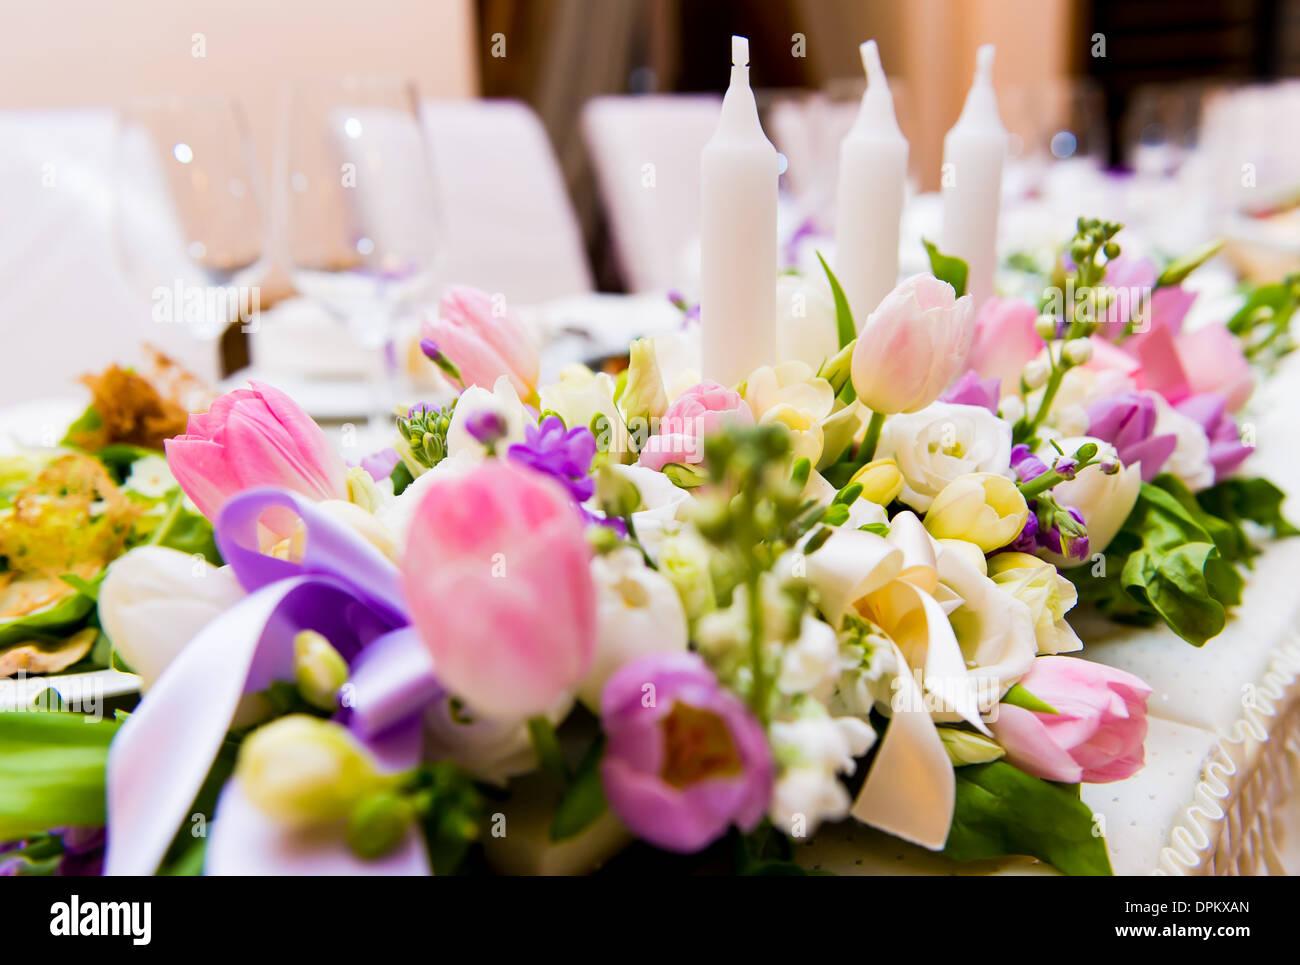 Decorate Decoration Flowers Wedding Stock Photos Decorate